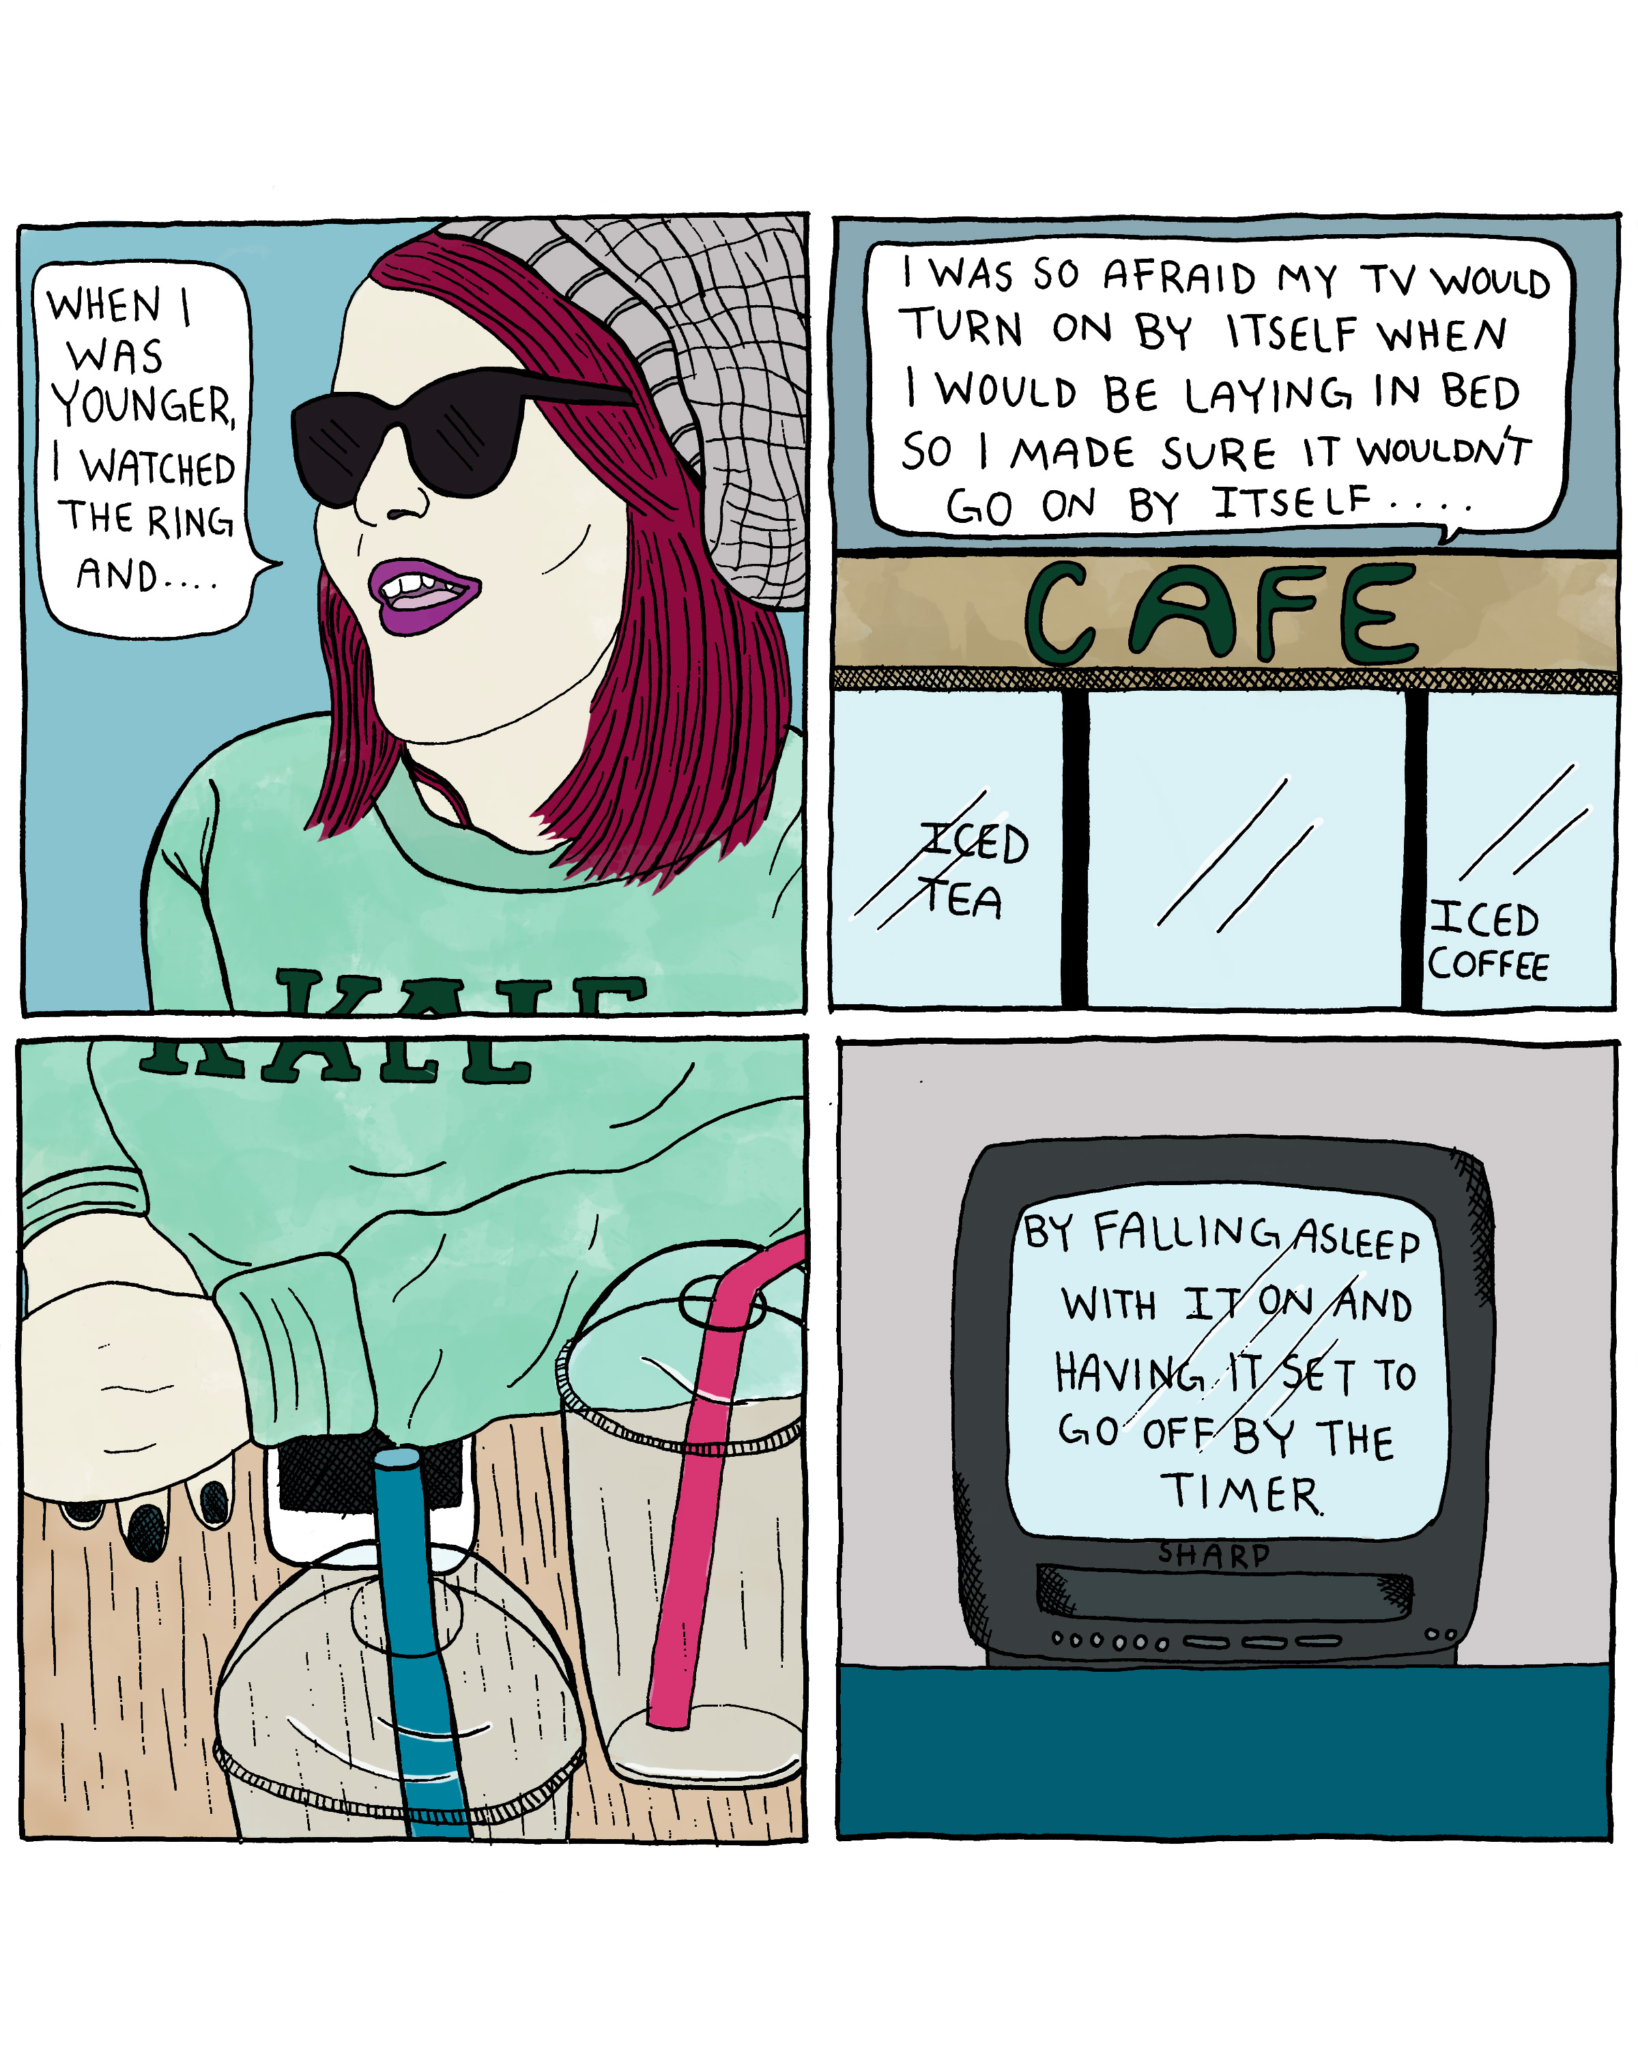 kendrickcoffee